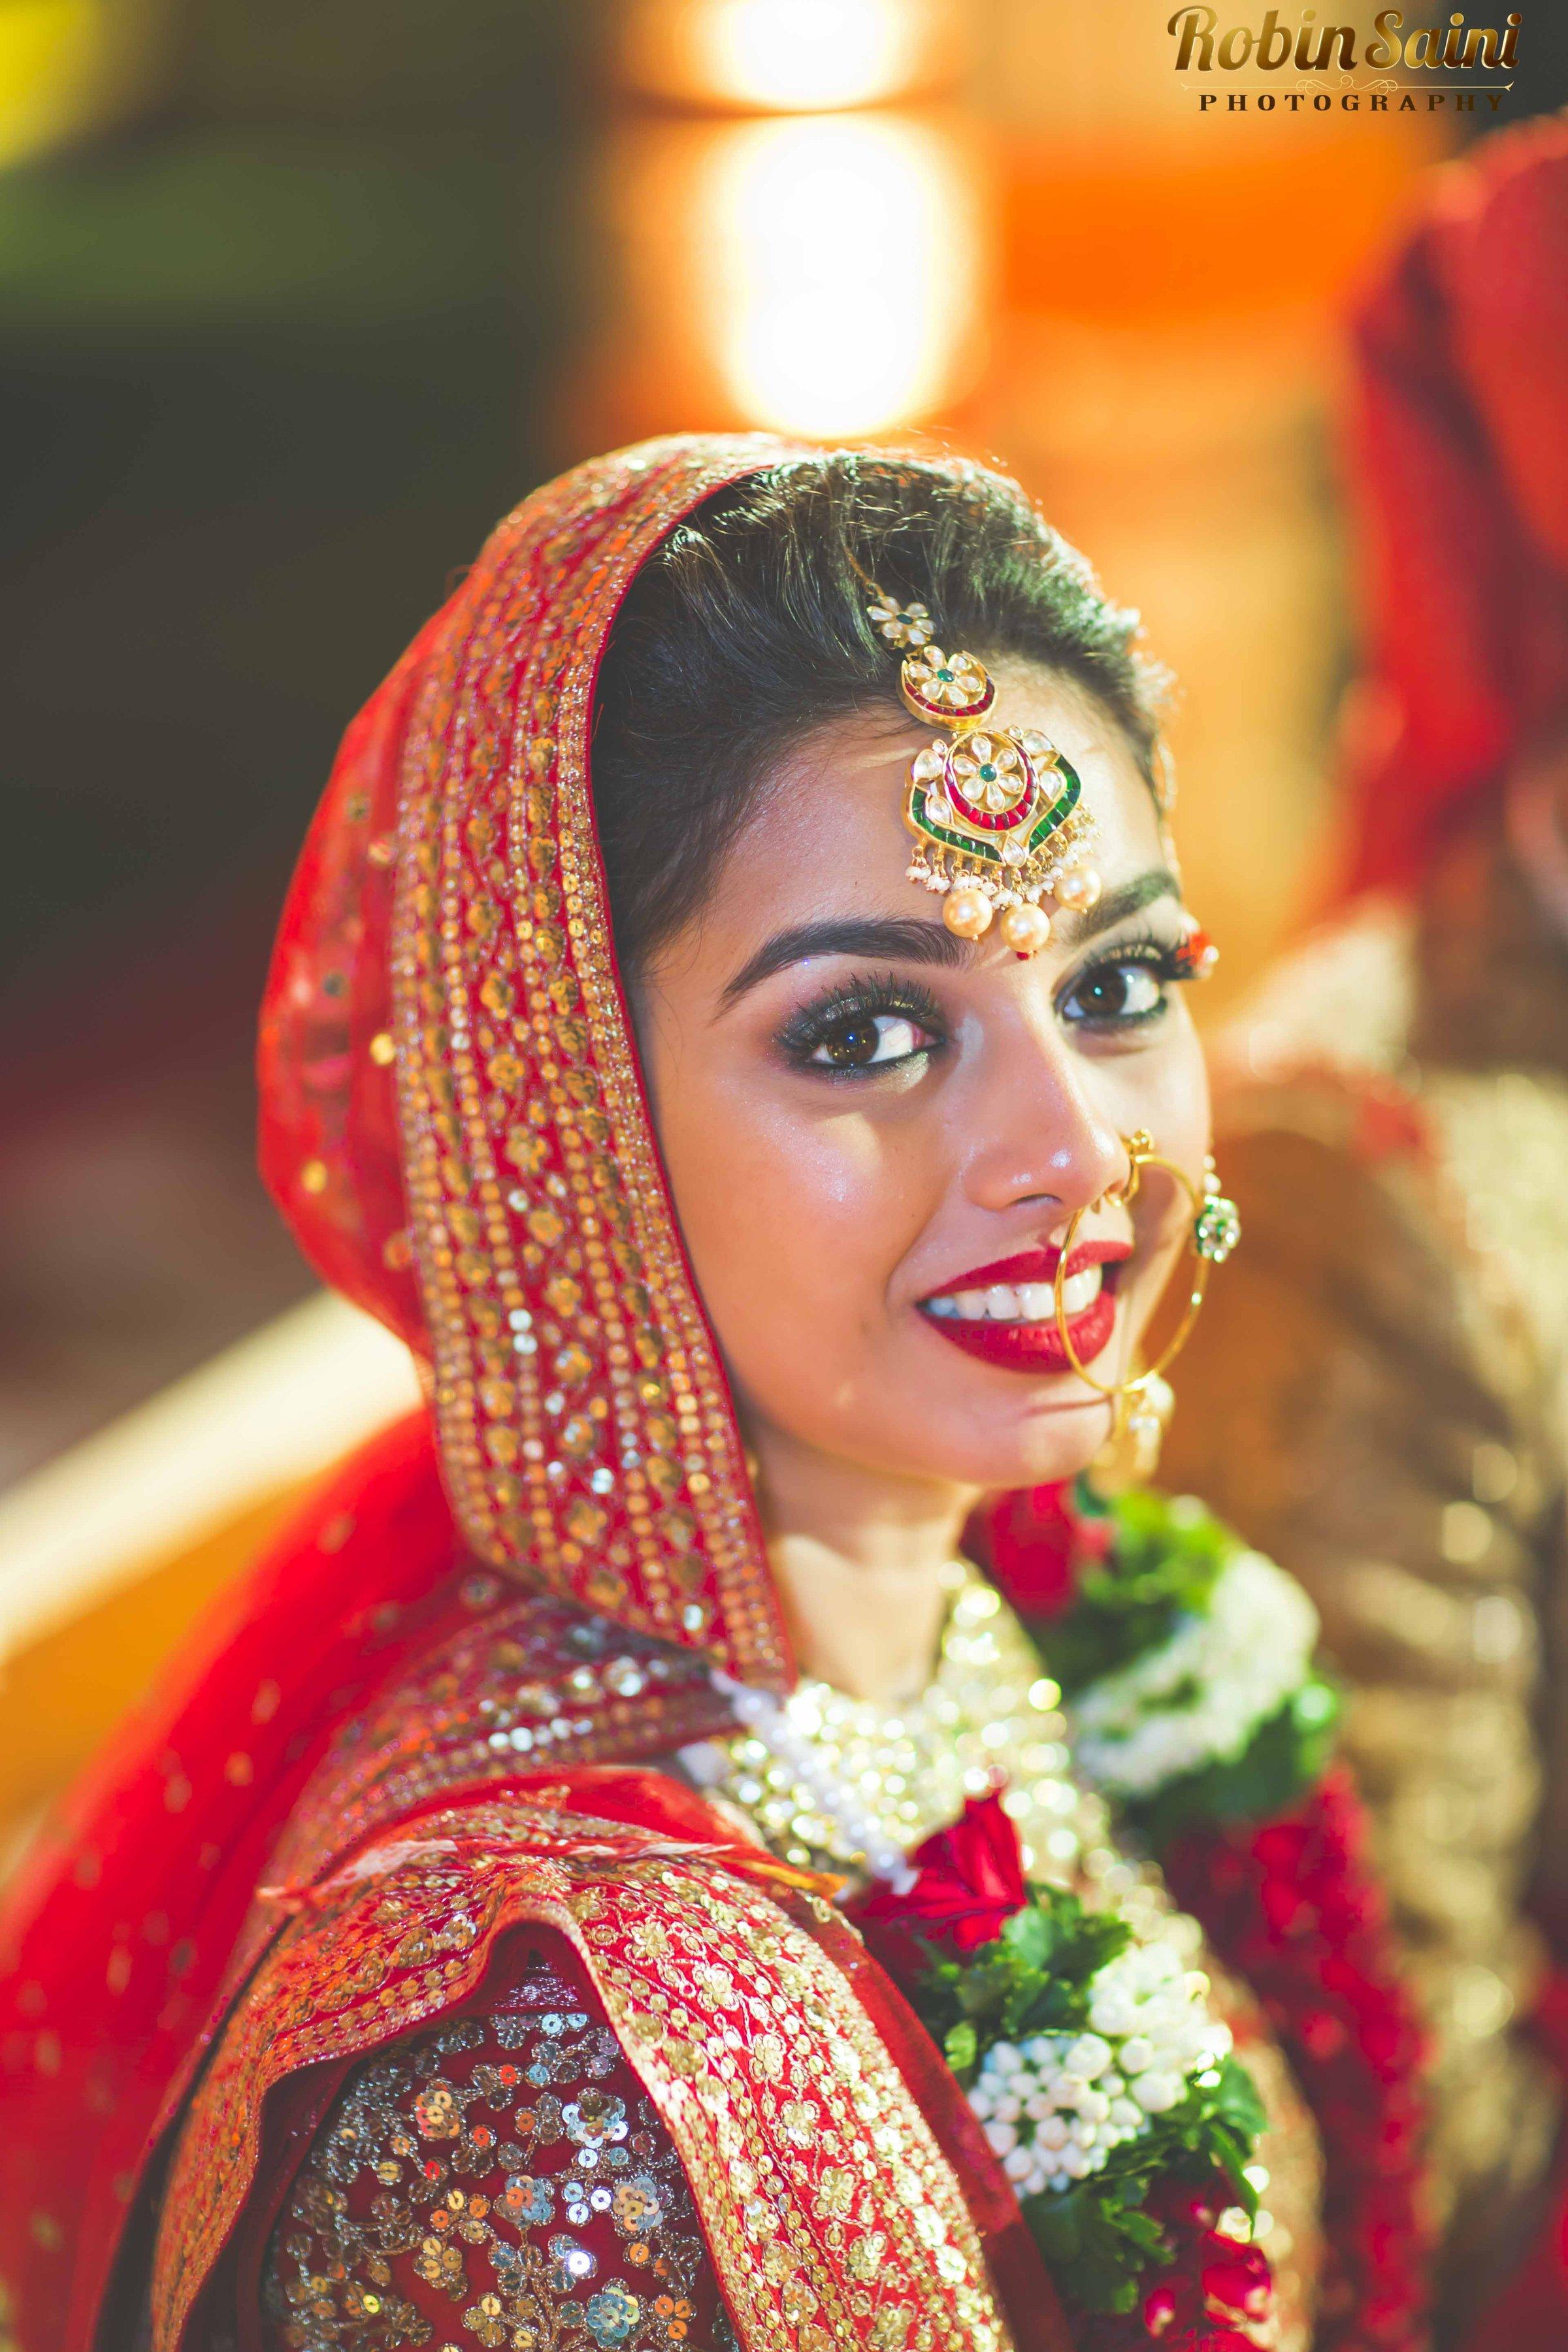 Best of the Best - Gorg Bridal Maangtikka Designs We've Seen on Brides!